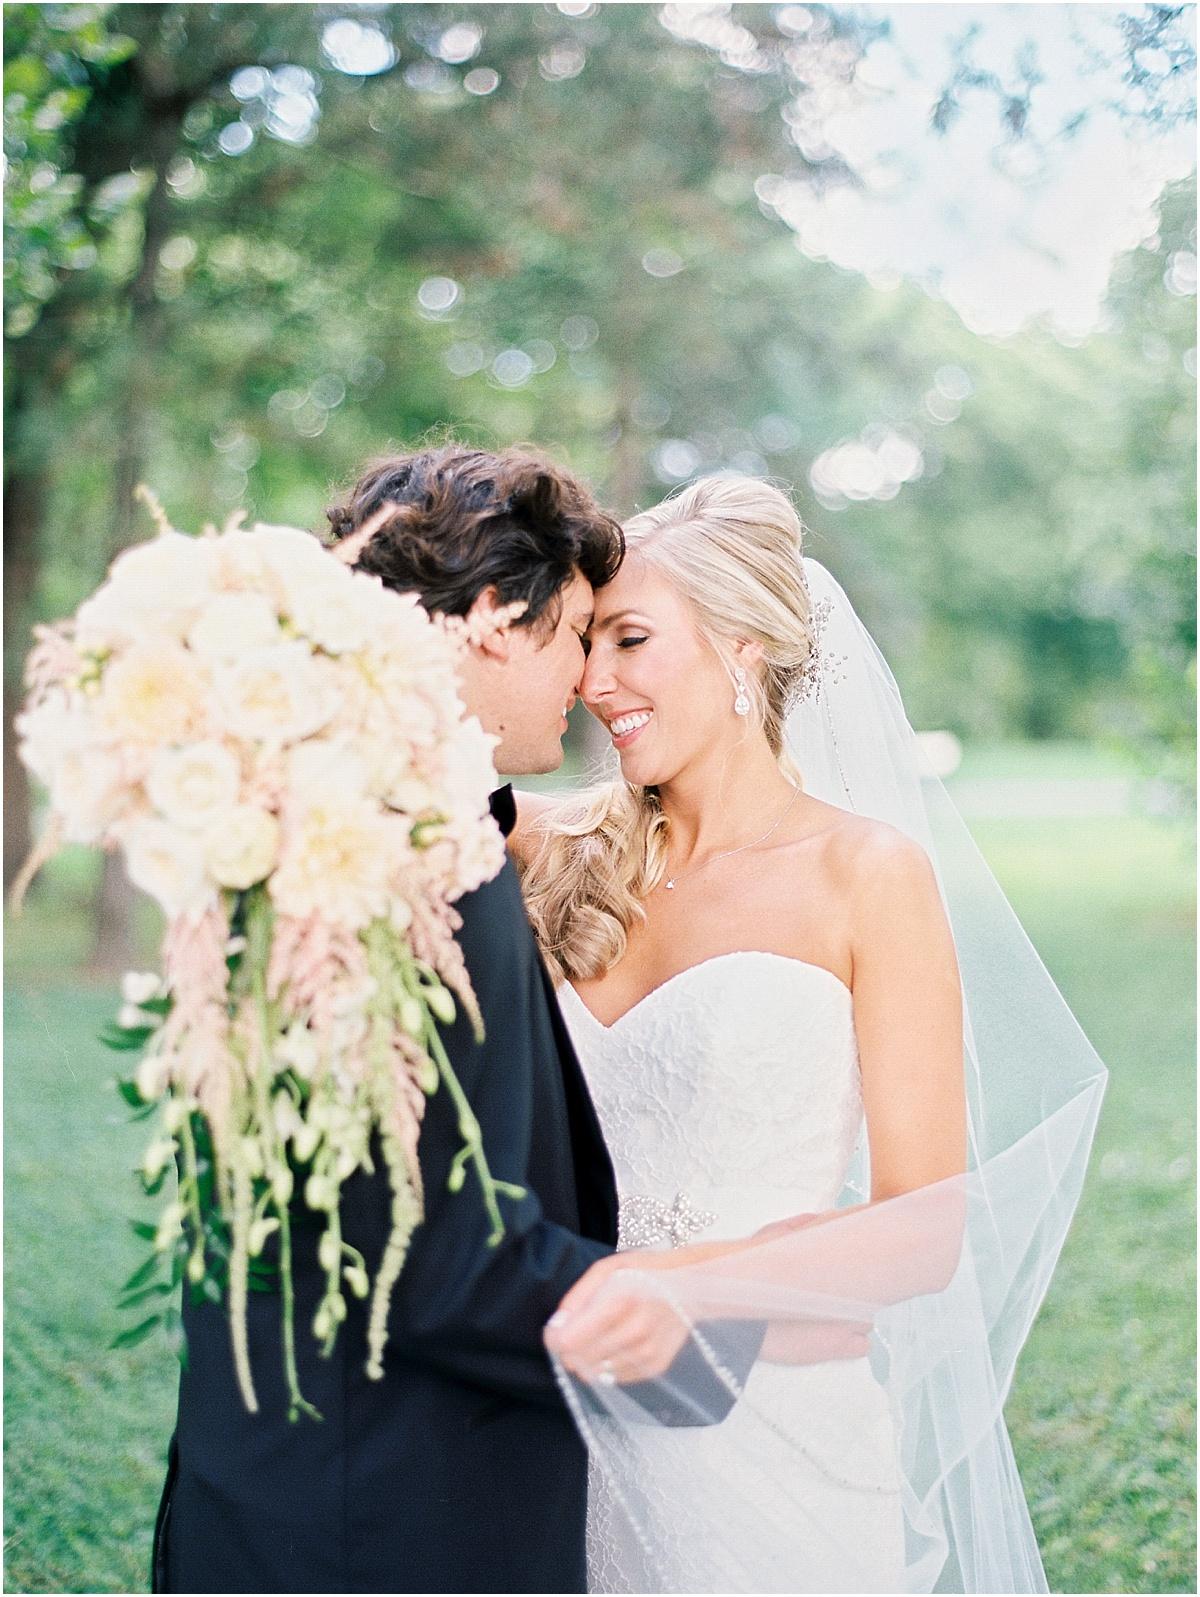 St_Louis_Wedding_Fine_Art_Film_Photographer_Jordan_Brittley_(www.jordanbrittley.com)_0034.jpg